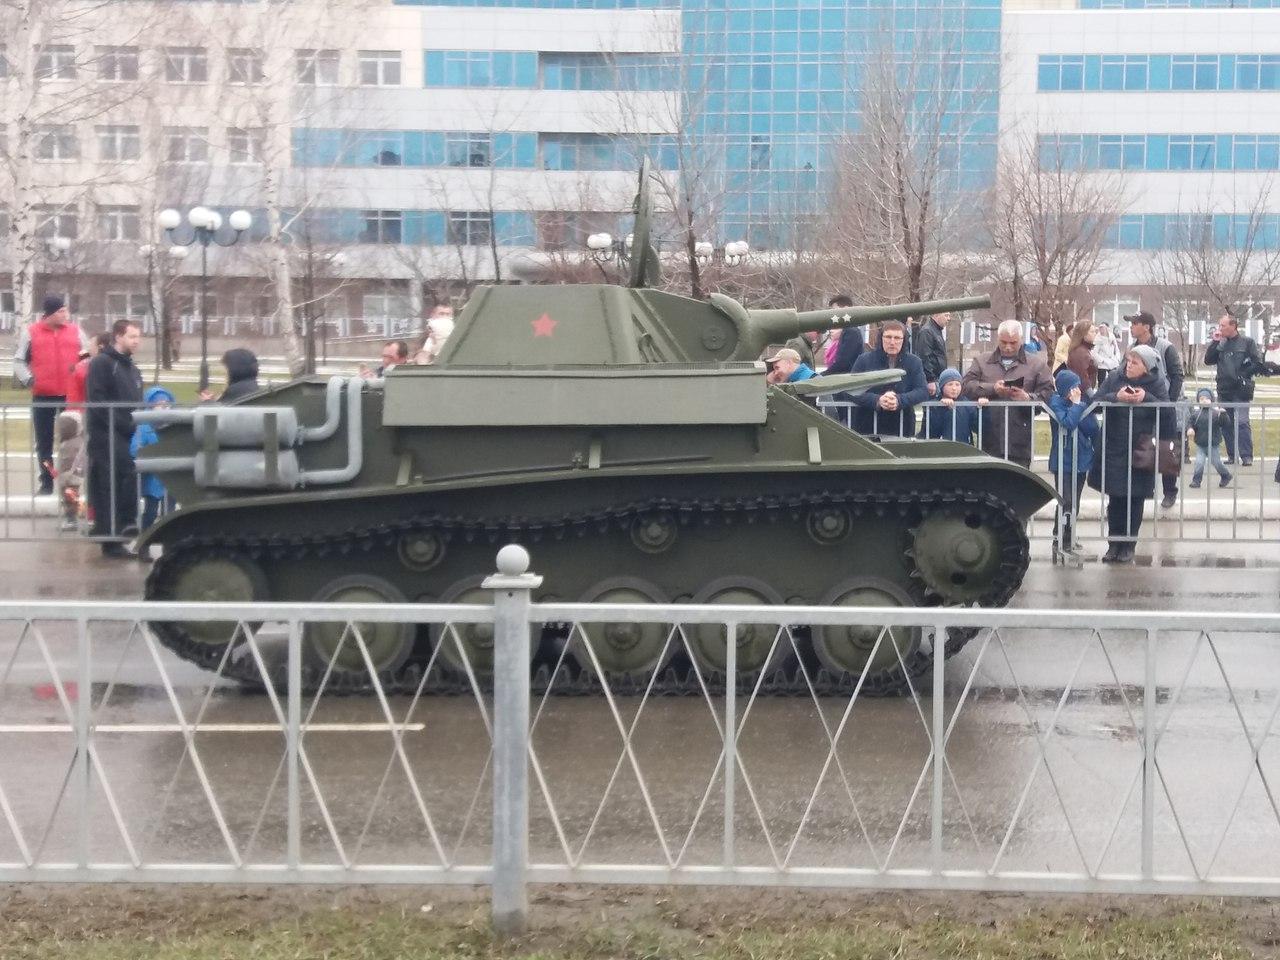 [WWII] Soviet tank development Ig3i8JmpG9k